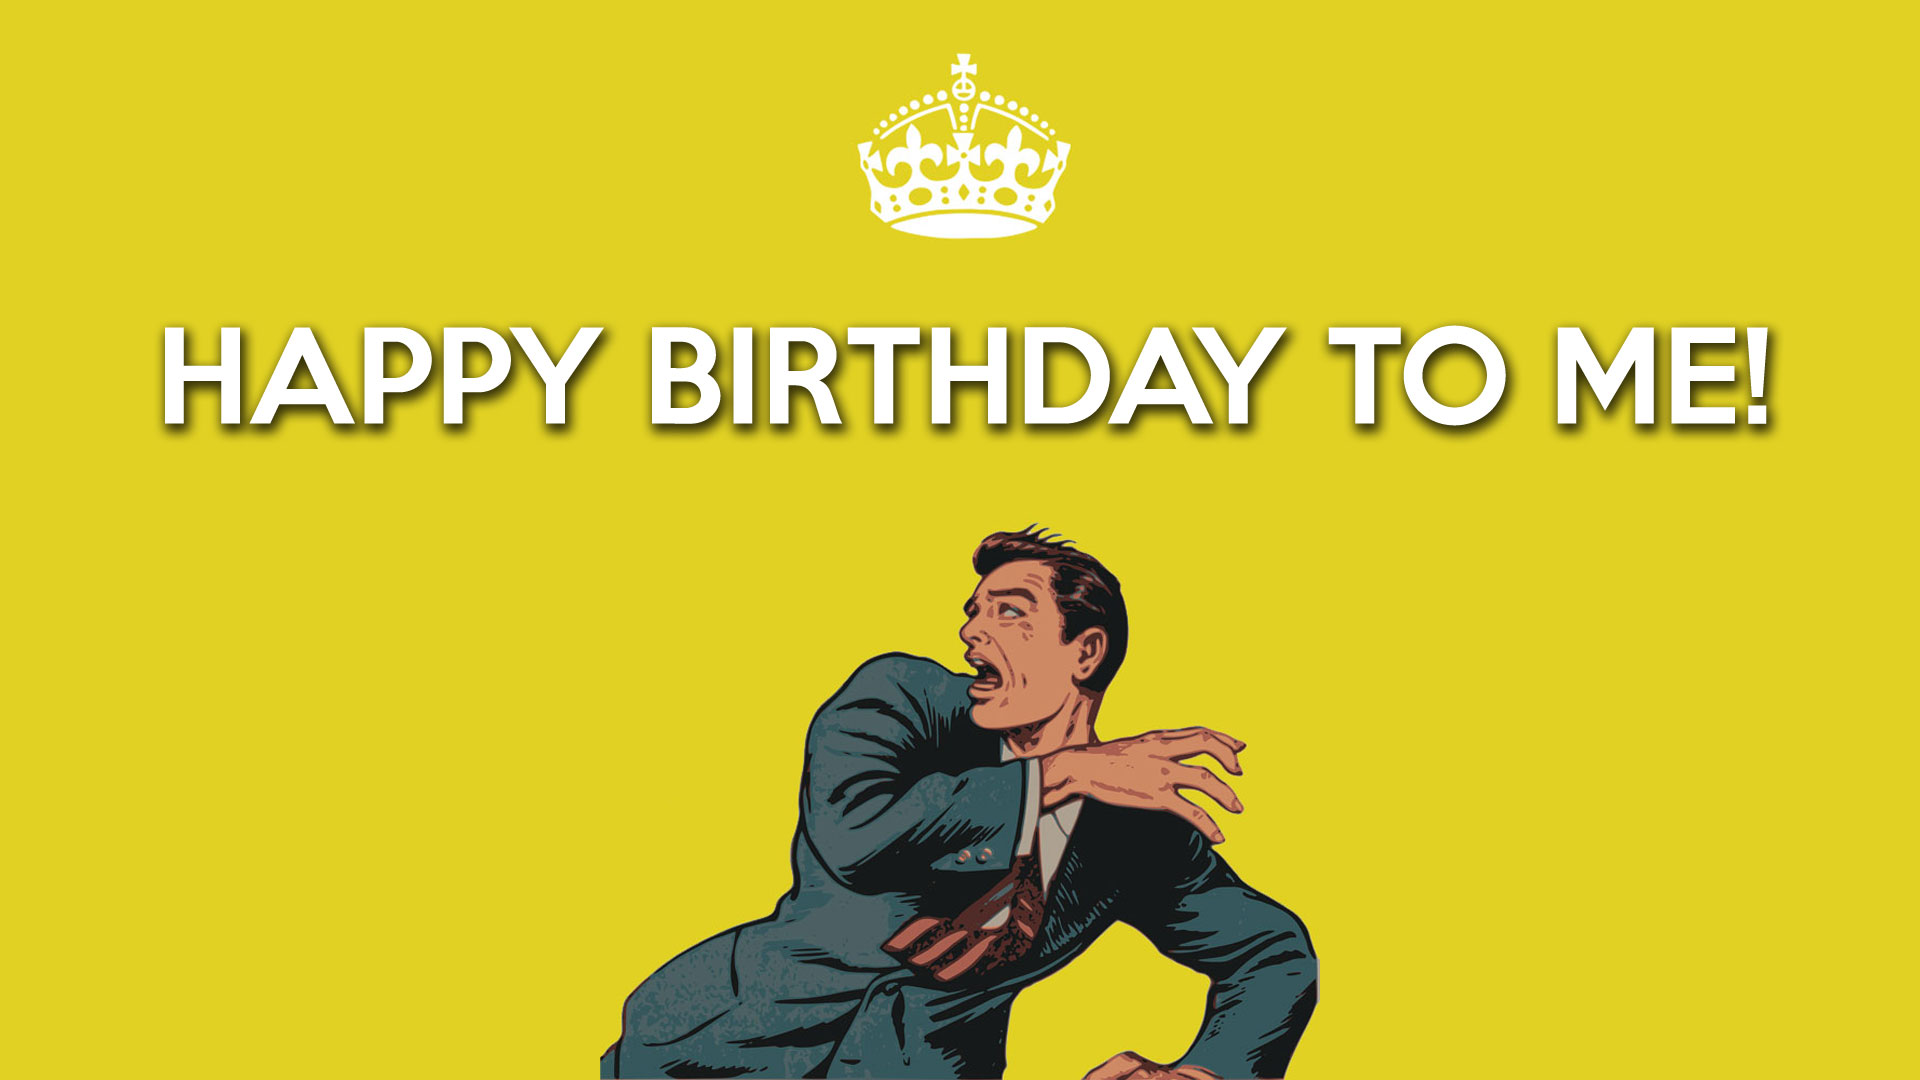 Happy Birthday To Me 102 Birthday Wishes For Myself